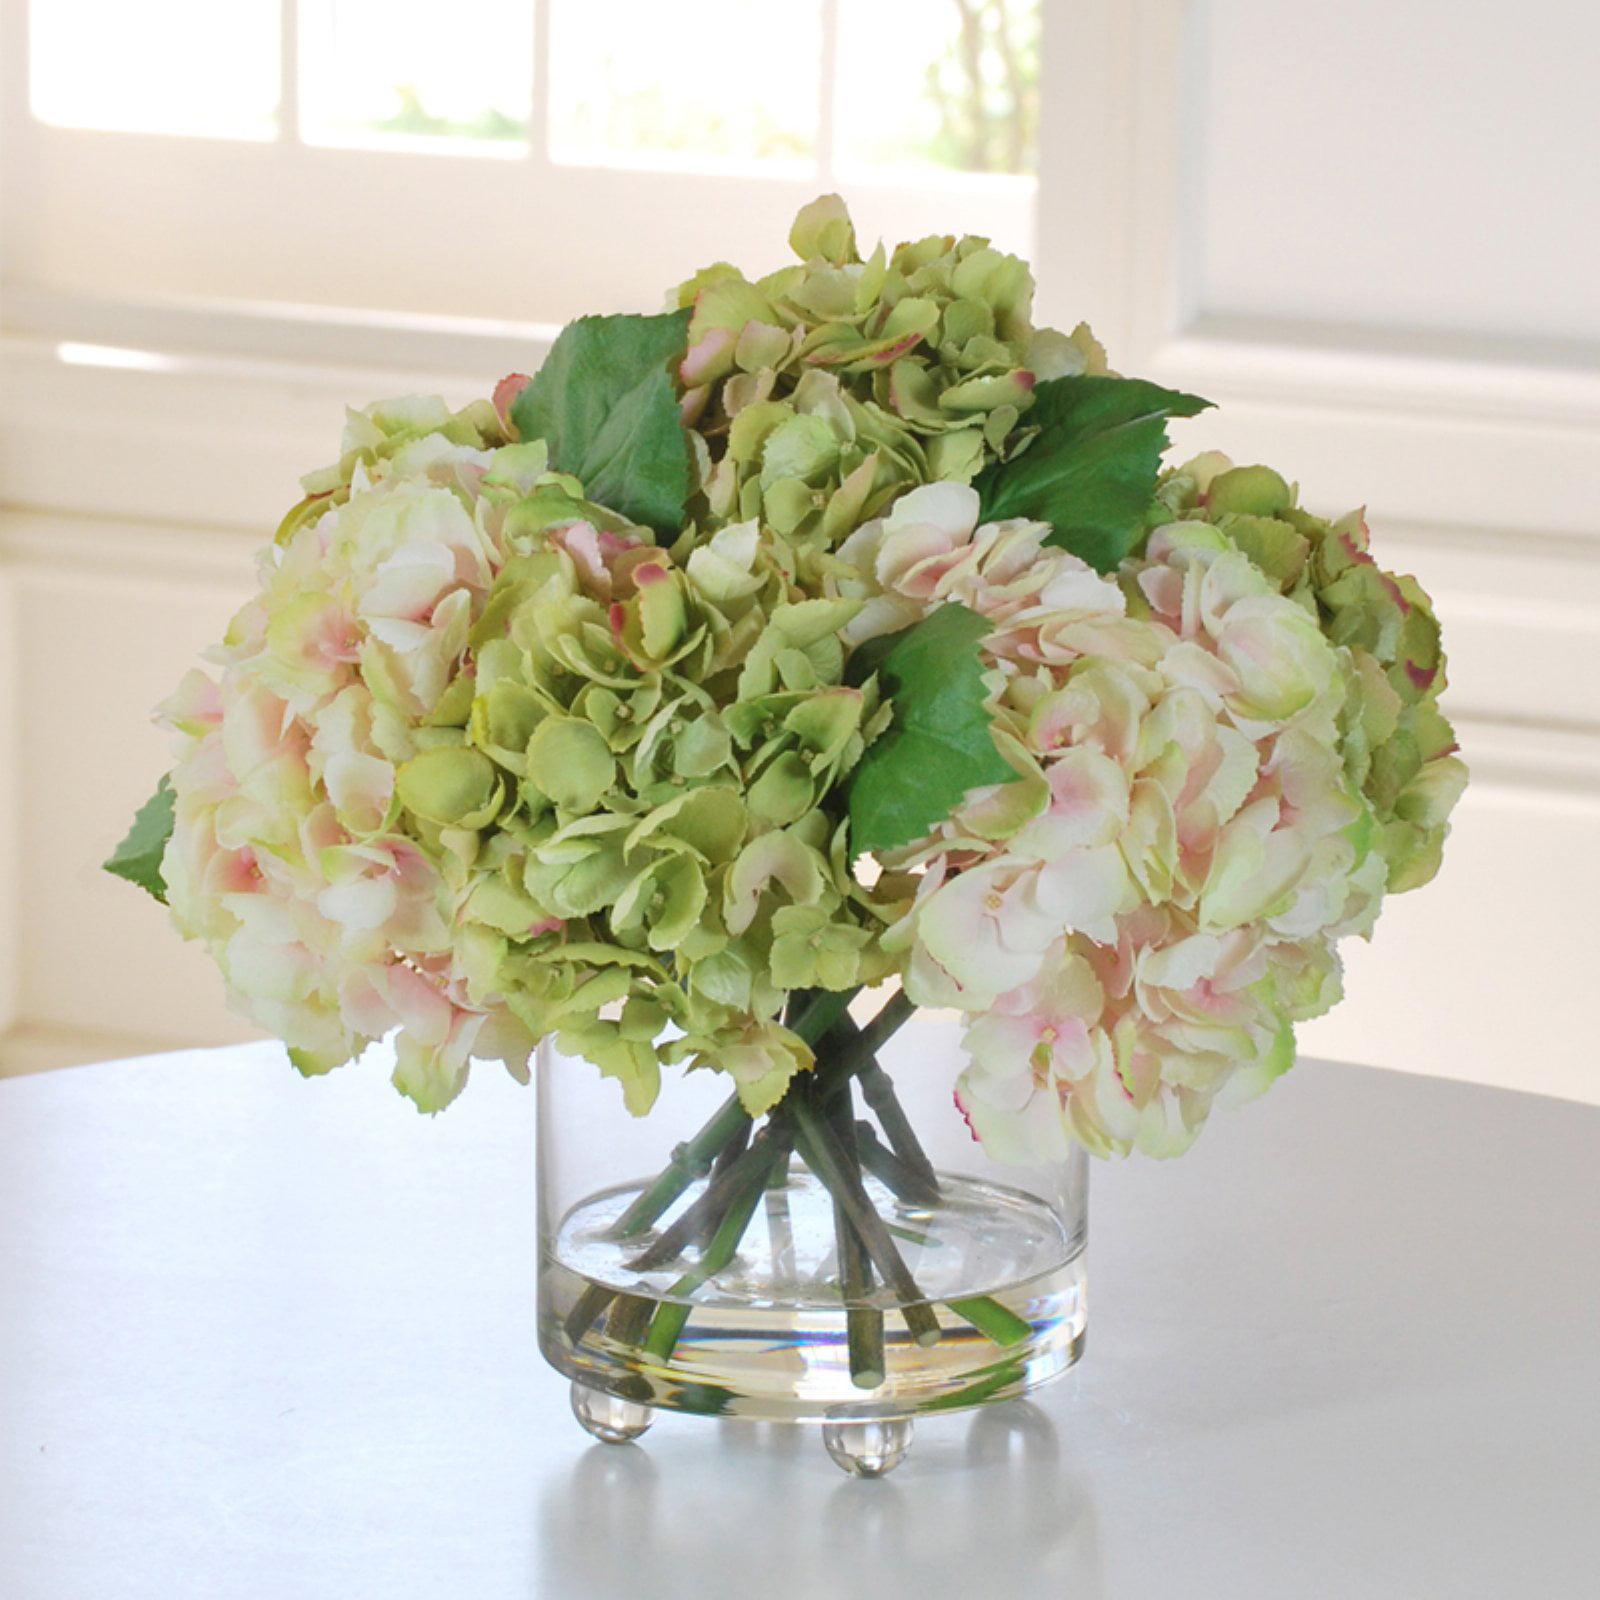 Jane Seymour Lavender Hydrangeas 15H in. Silk Flower Arra...